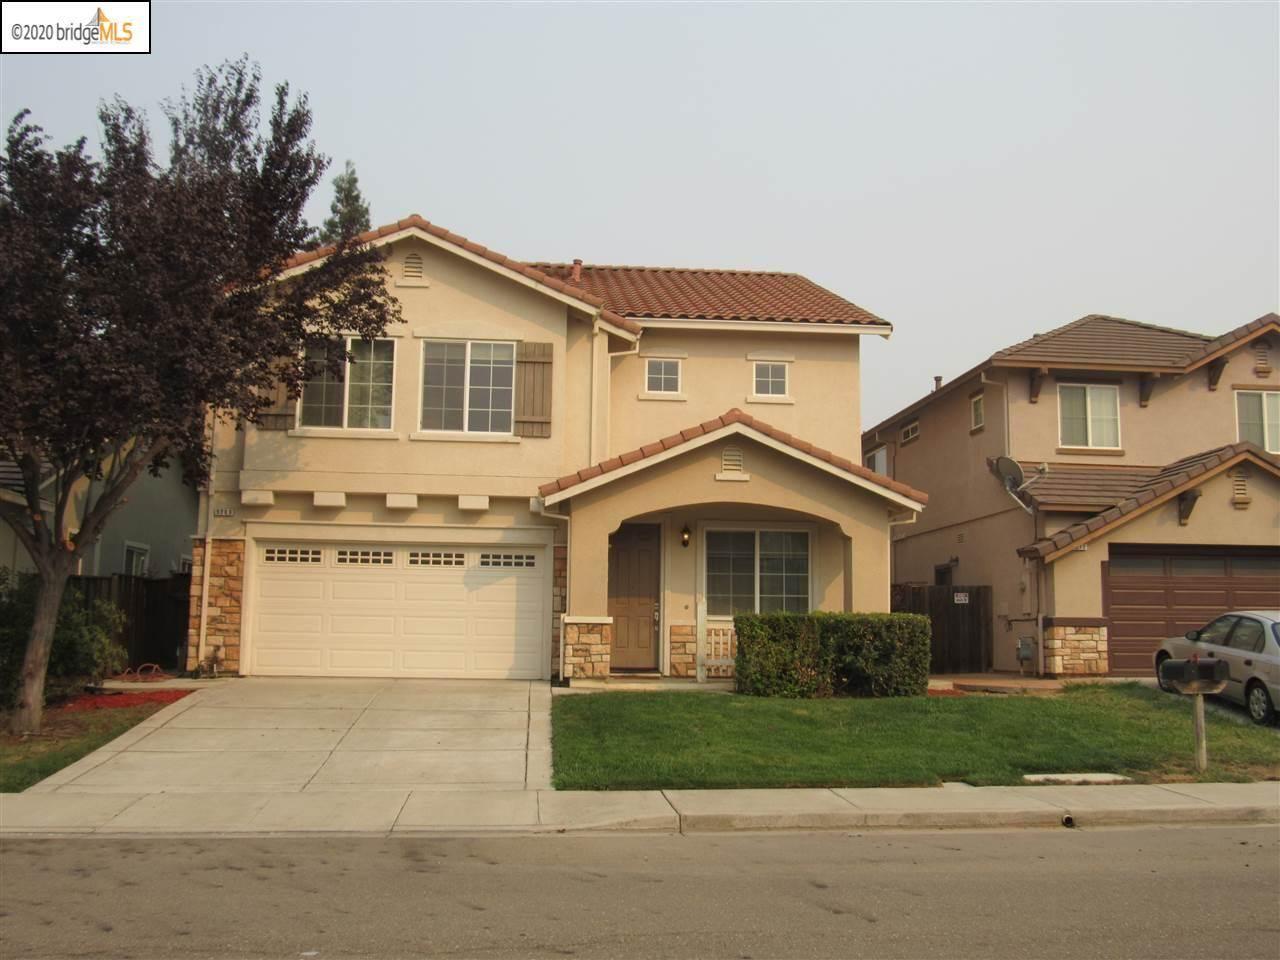 5209 Sungrove Way, Antioch, CA 94531